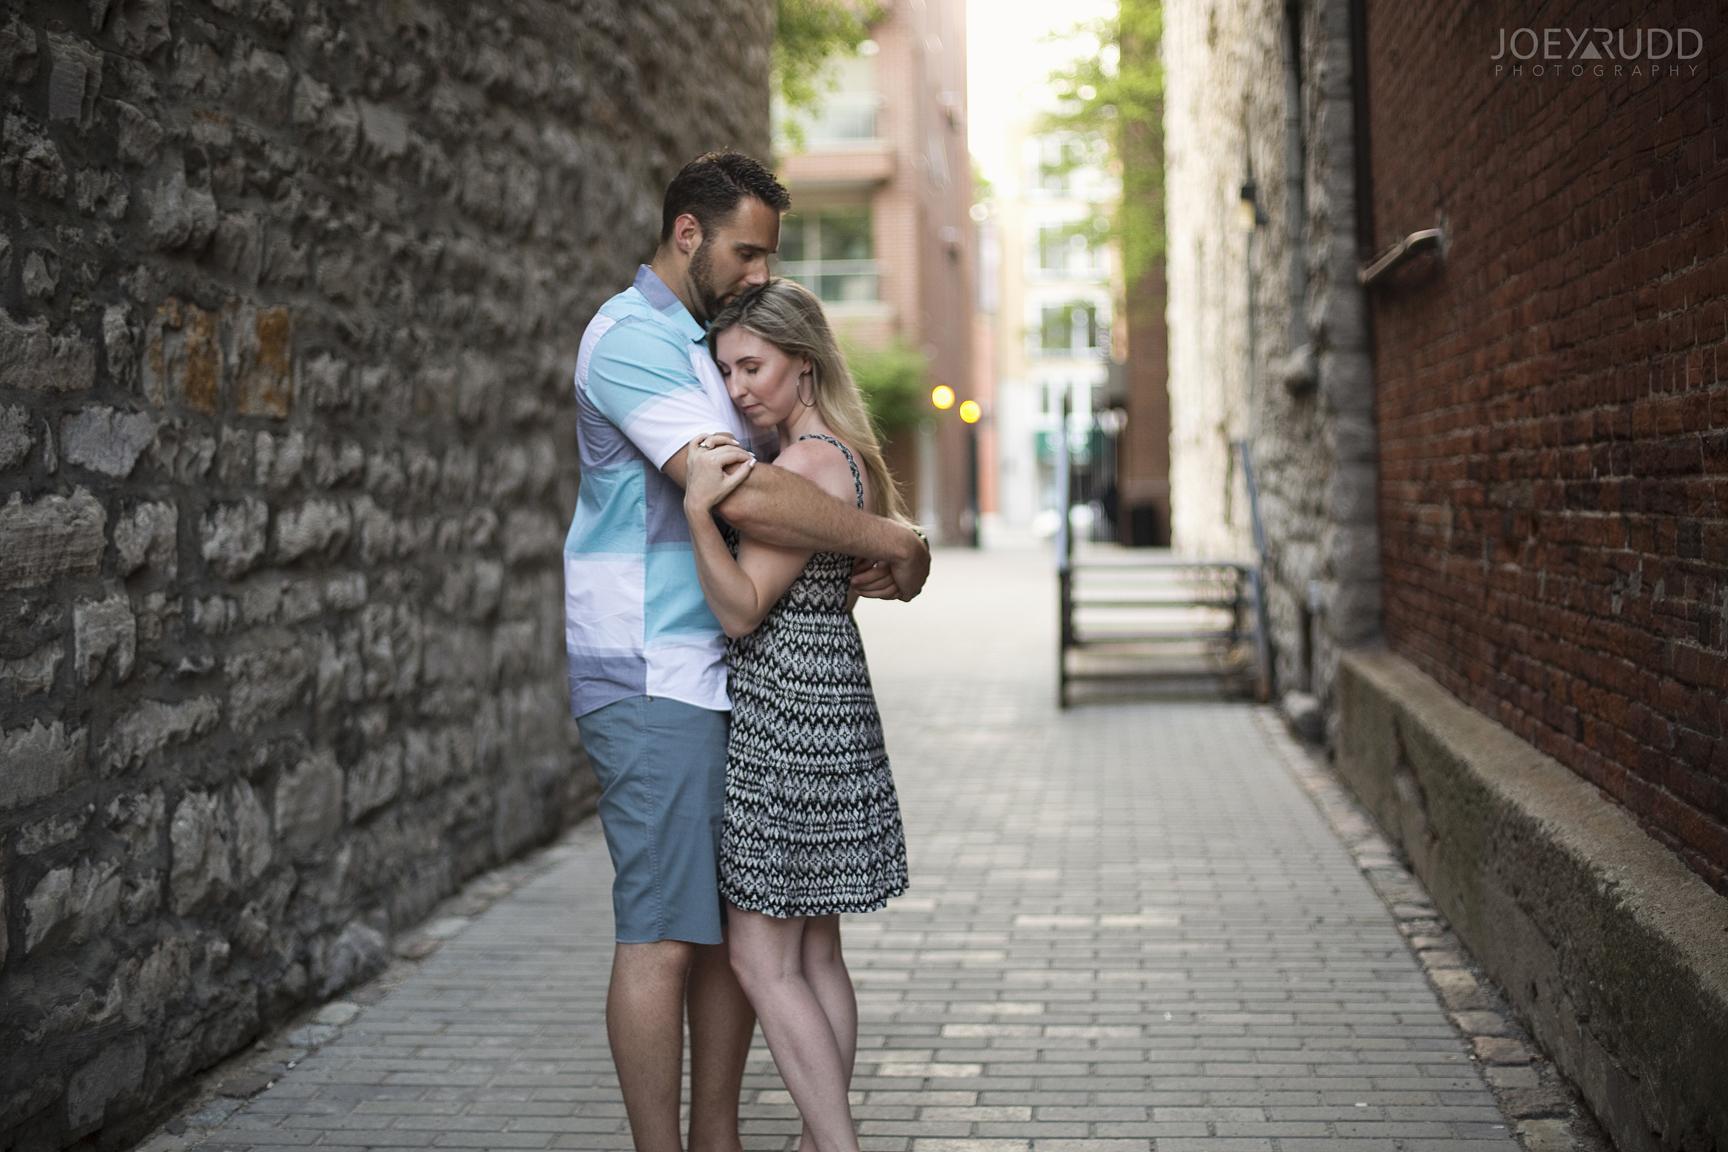 Joey Rudd Photography Ottawa Wedding Photographer Engagement Alley